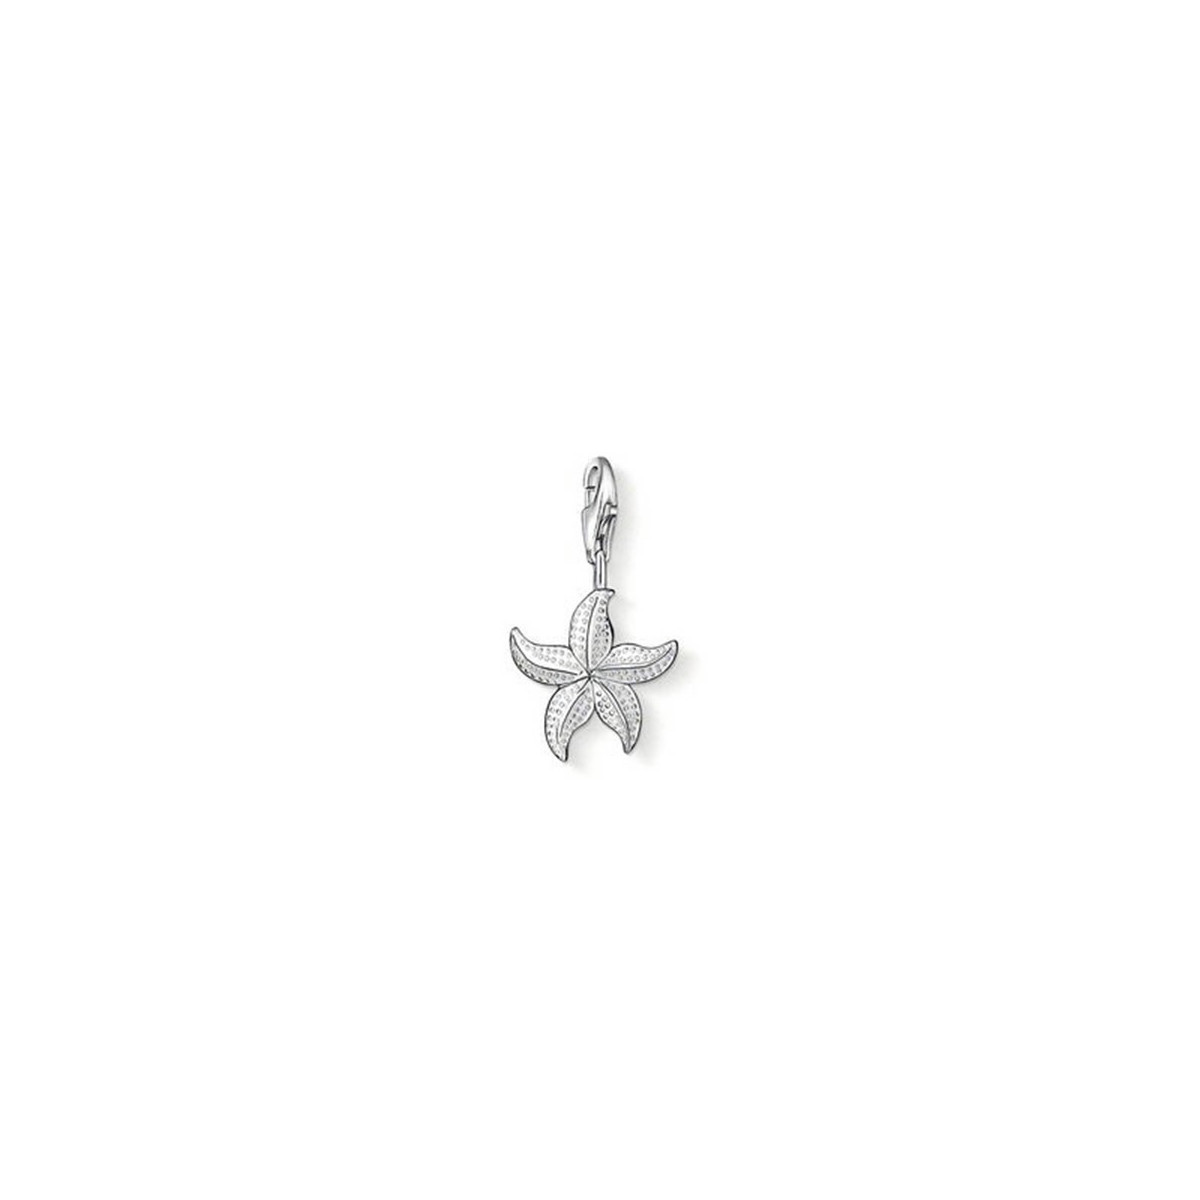 Charm Thomas Sabo Estrella de Mar